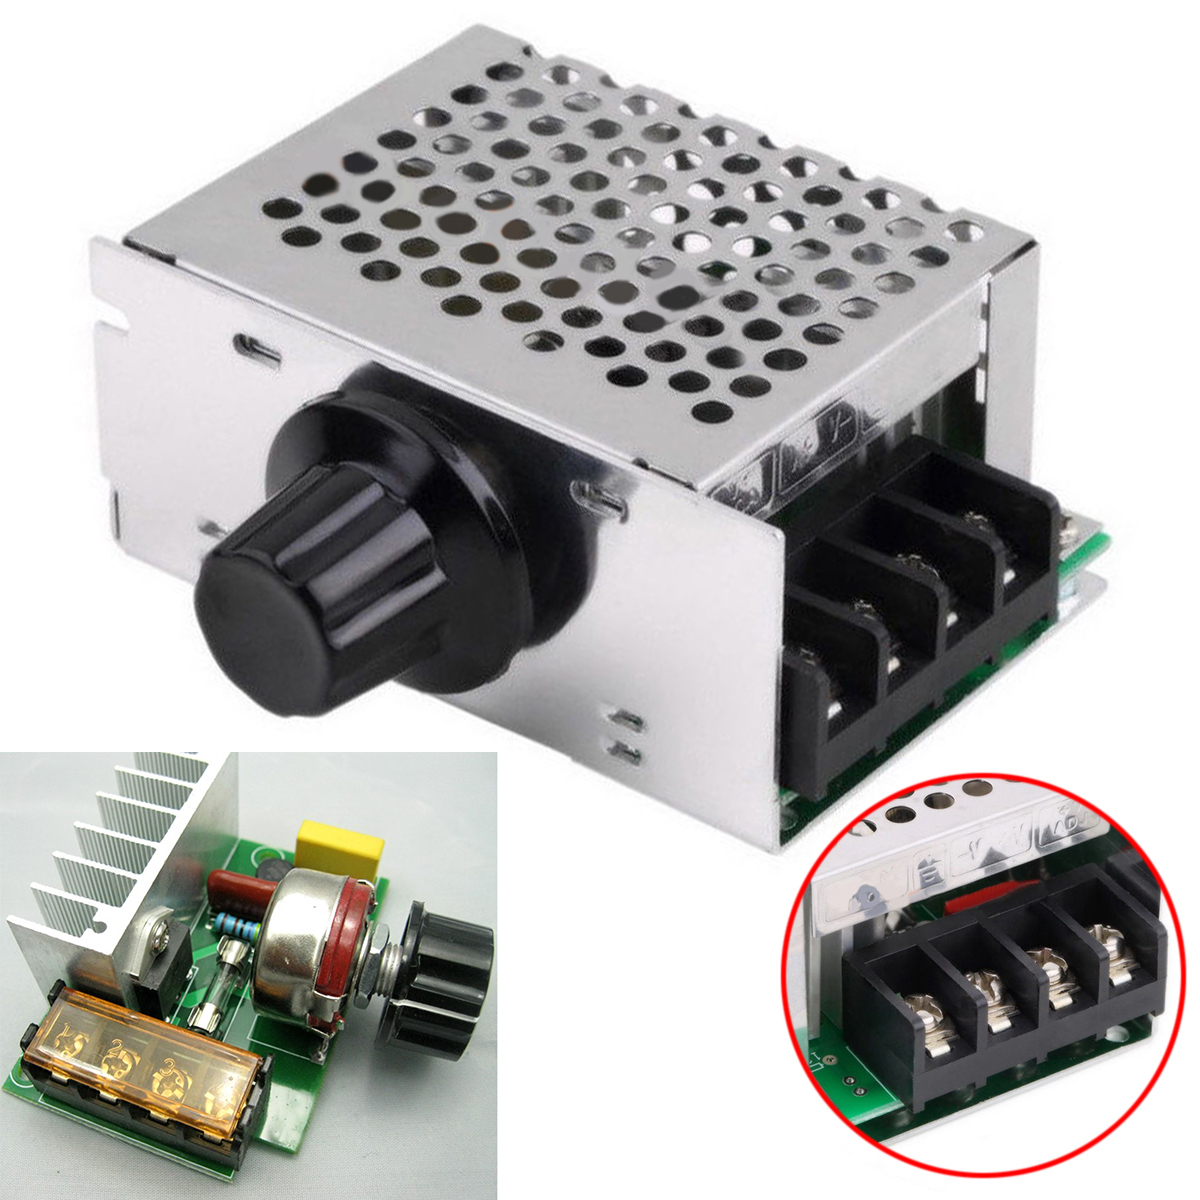 купить 4000W 220V AC SCR Voltage Regulator Mayitr Motor Speed Controller Module Dimmer for Electric Furnace Water Heater 89*59*38mm недорого